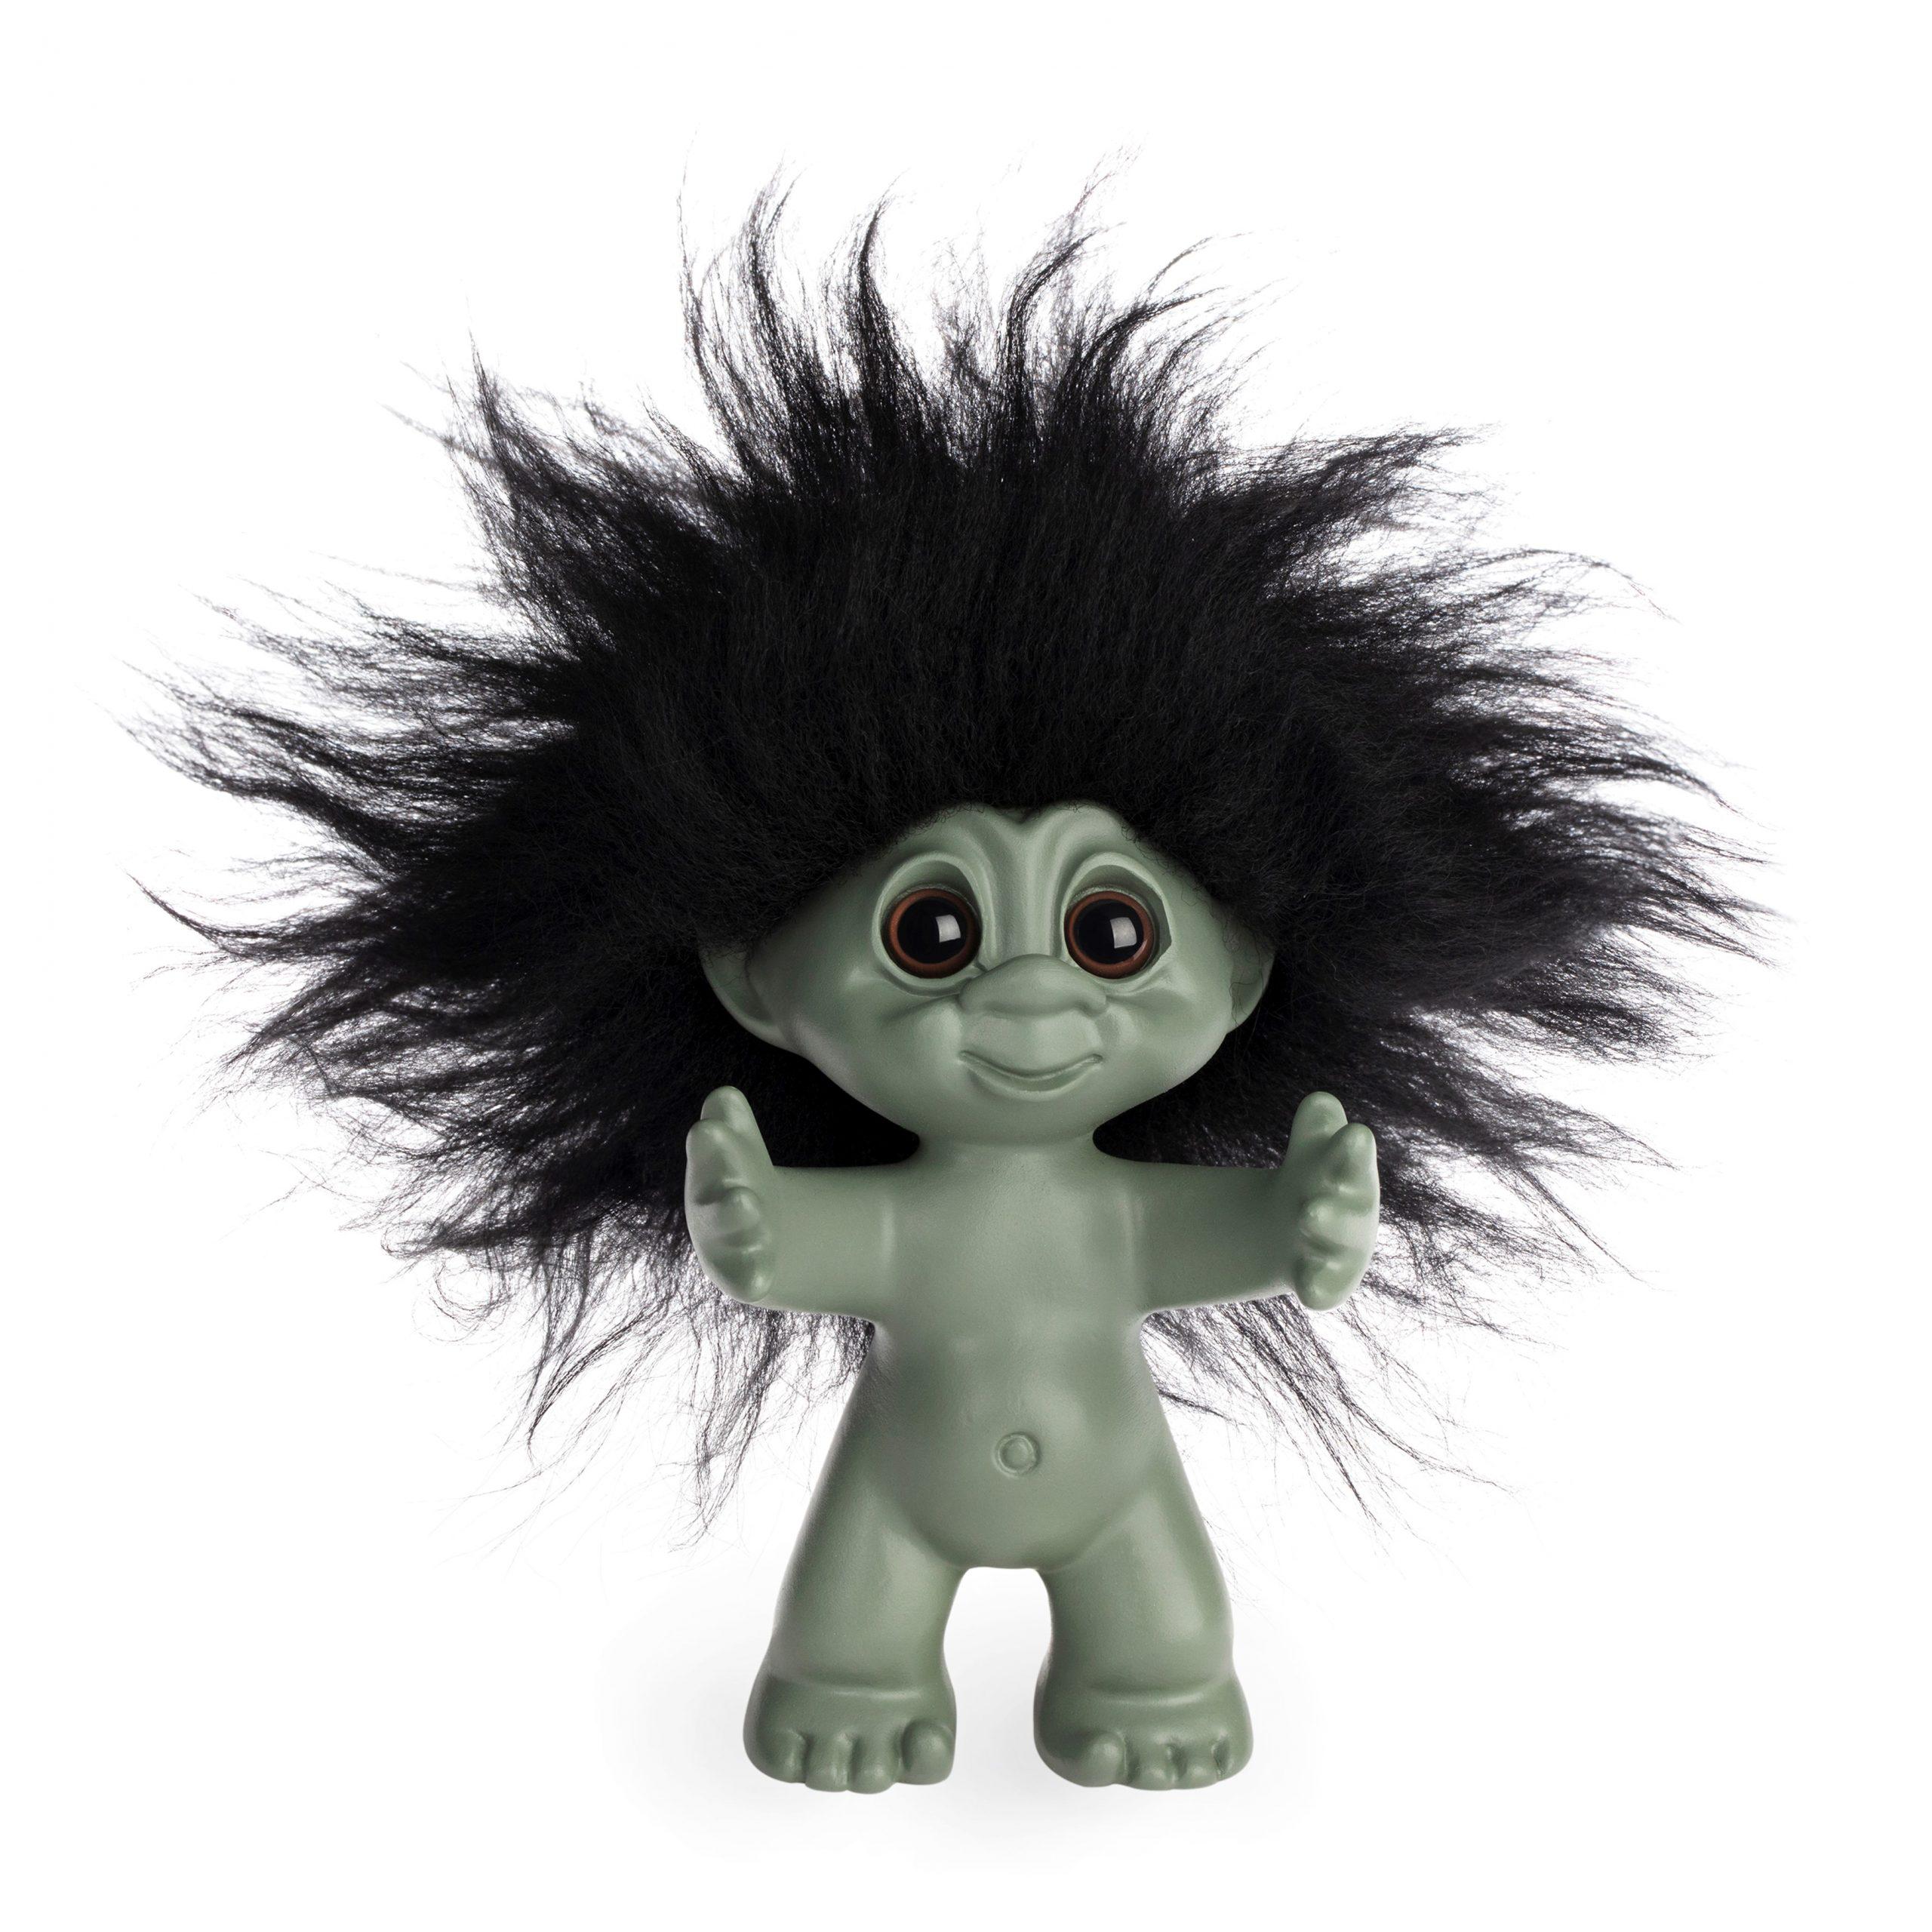 Goodluck Troll – Green With Black Hair